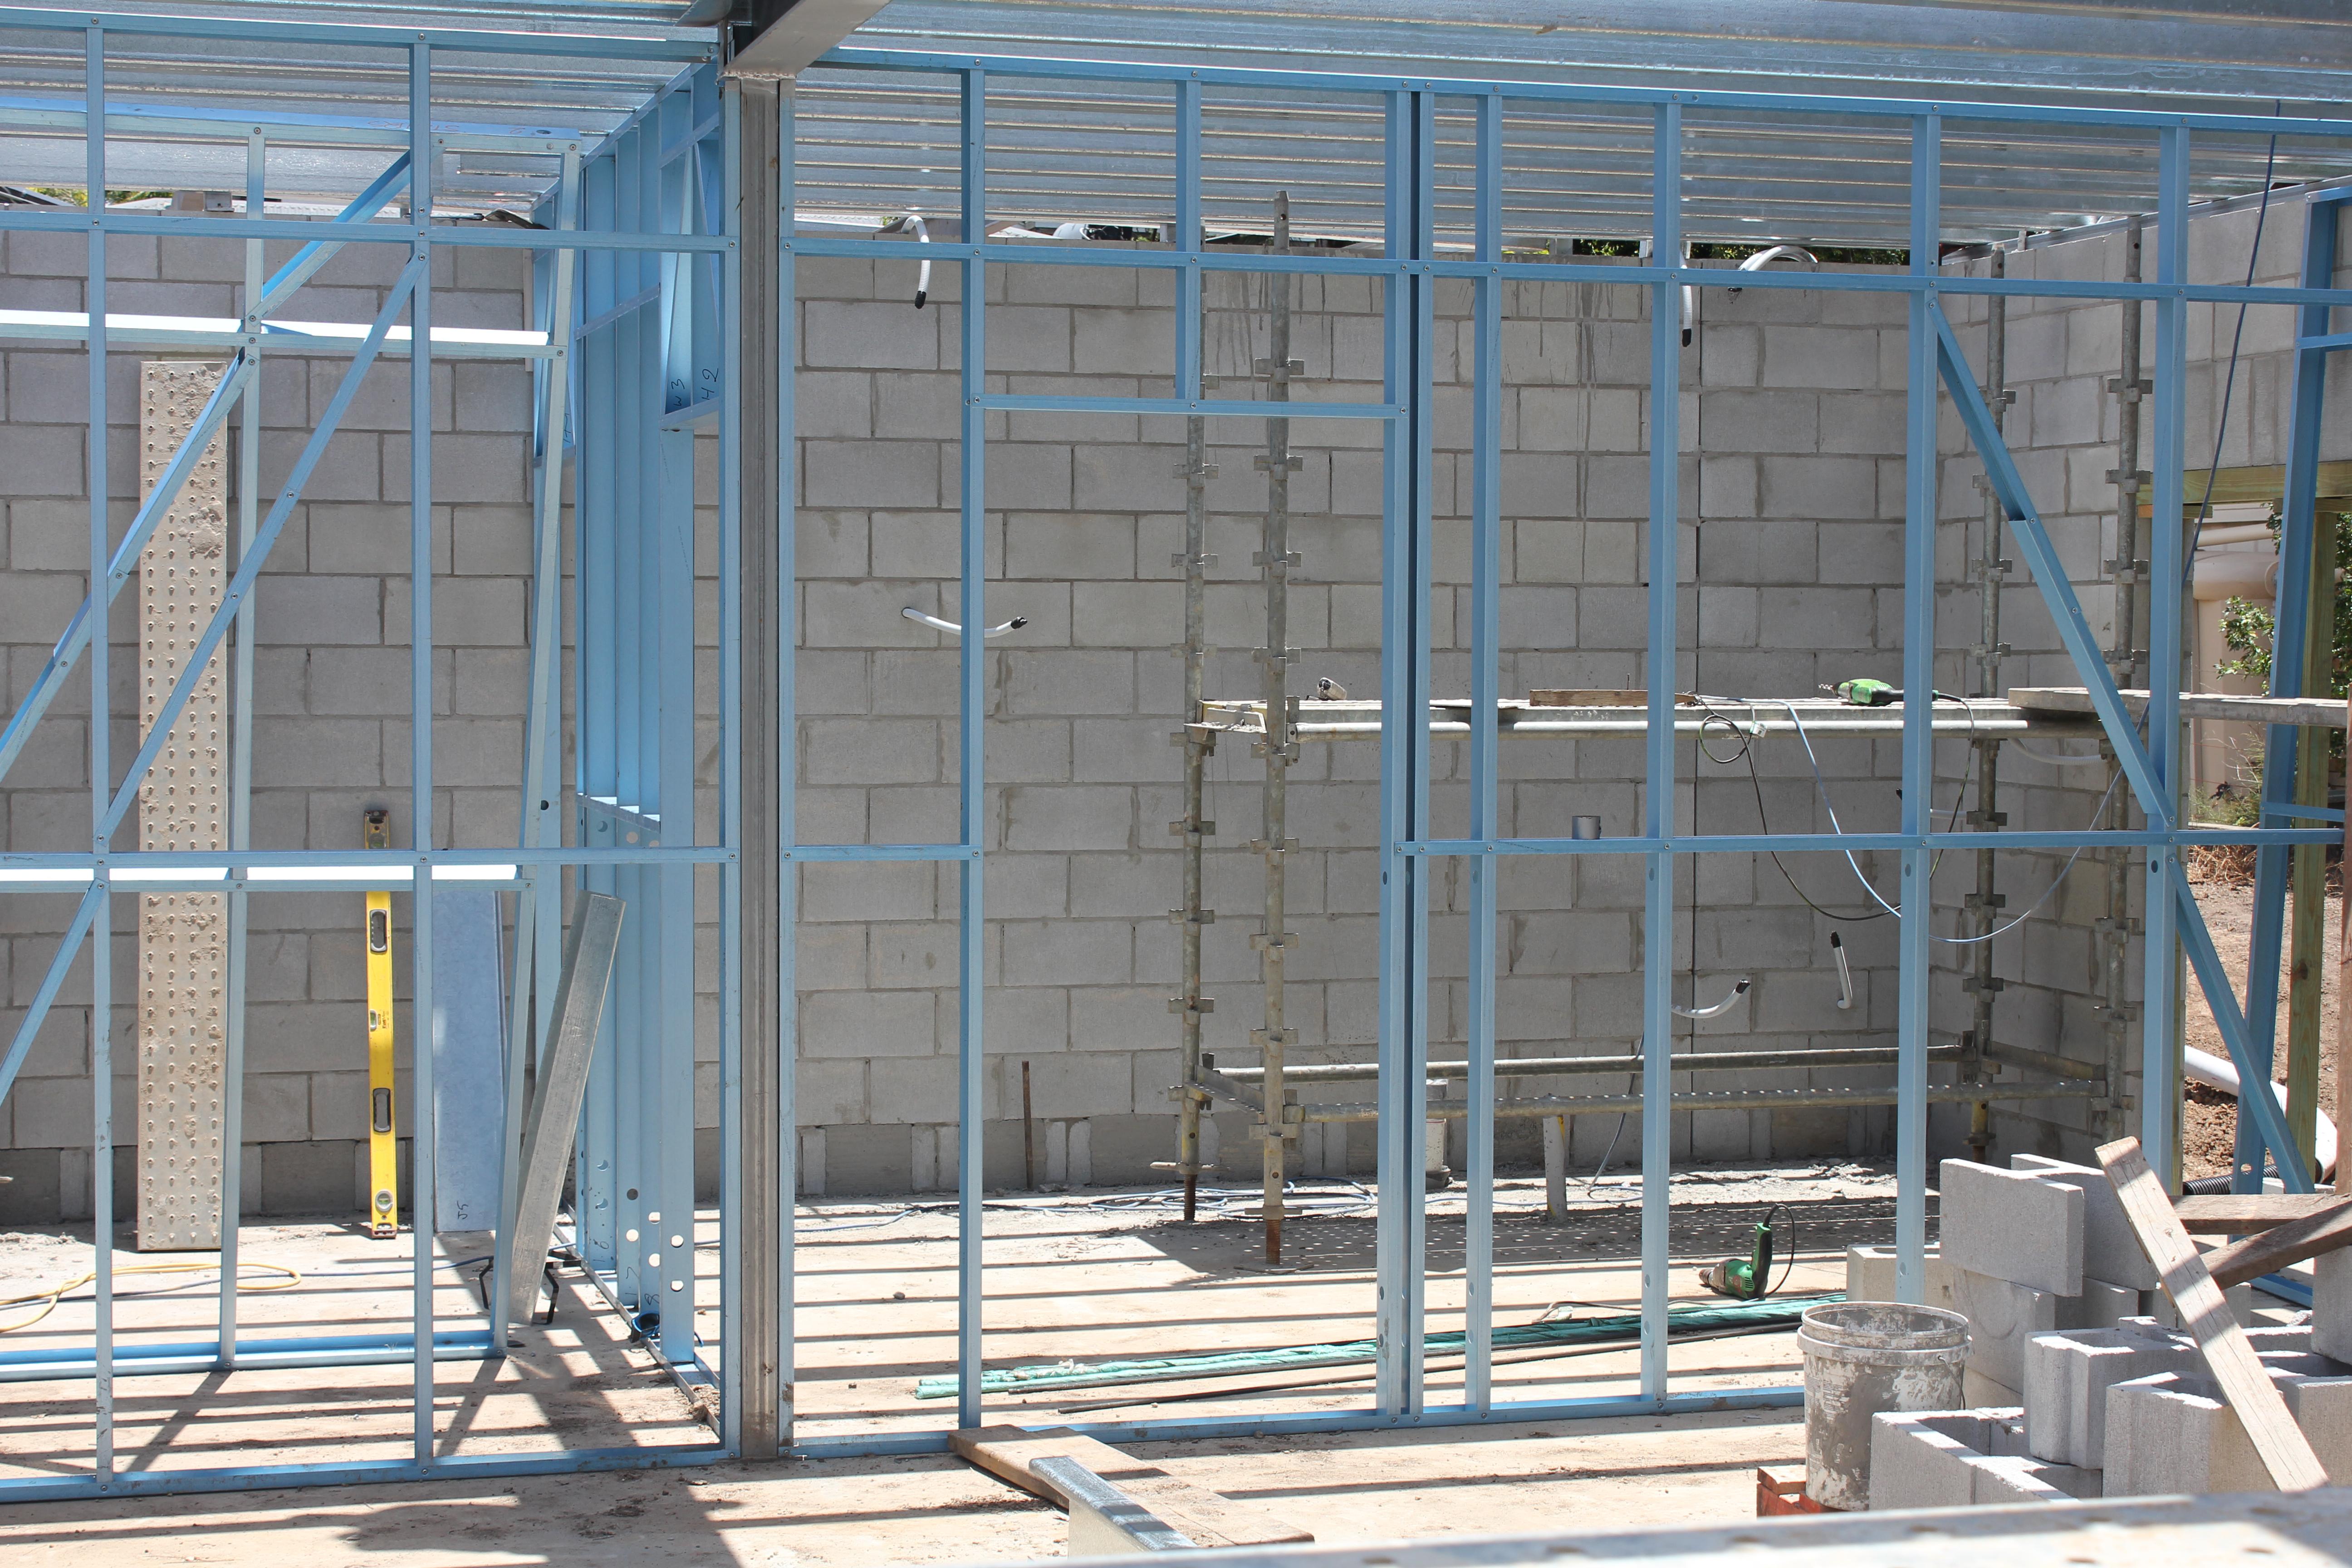 designer home builders queensland 78297126n03 graceville - Designer Home Builders